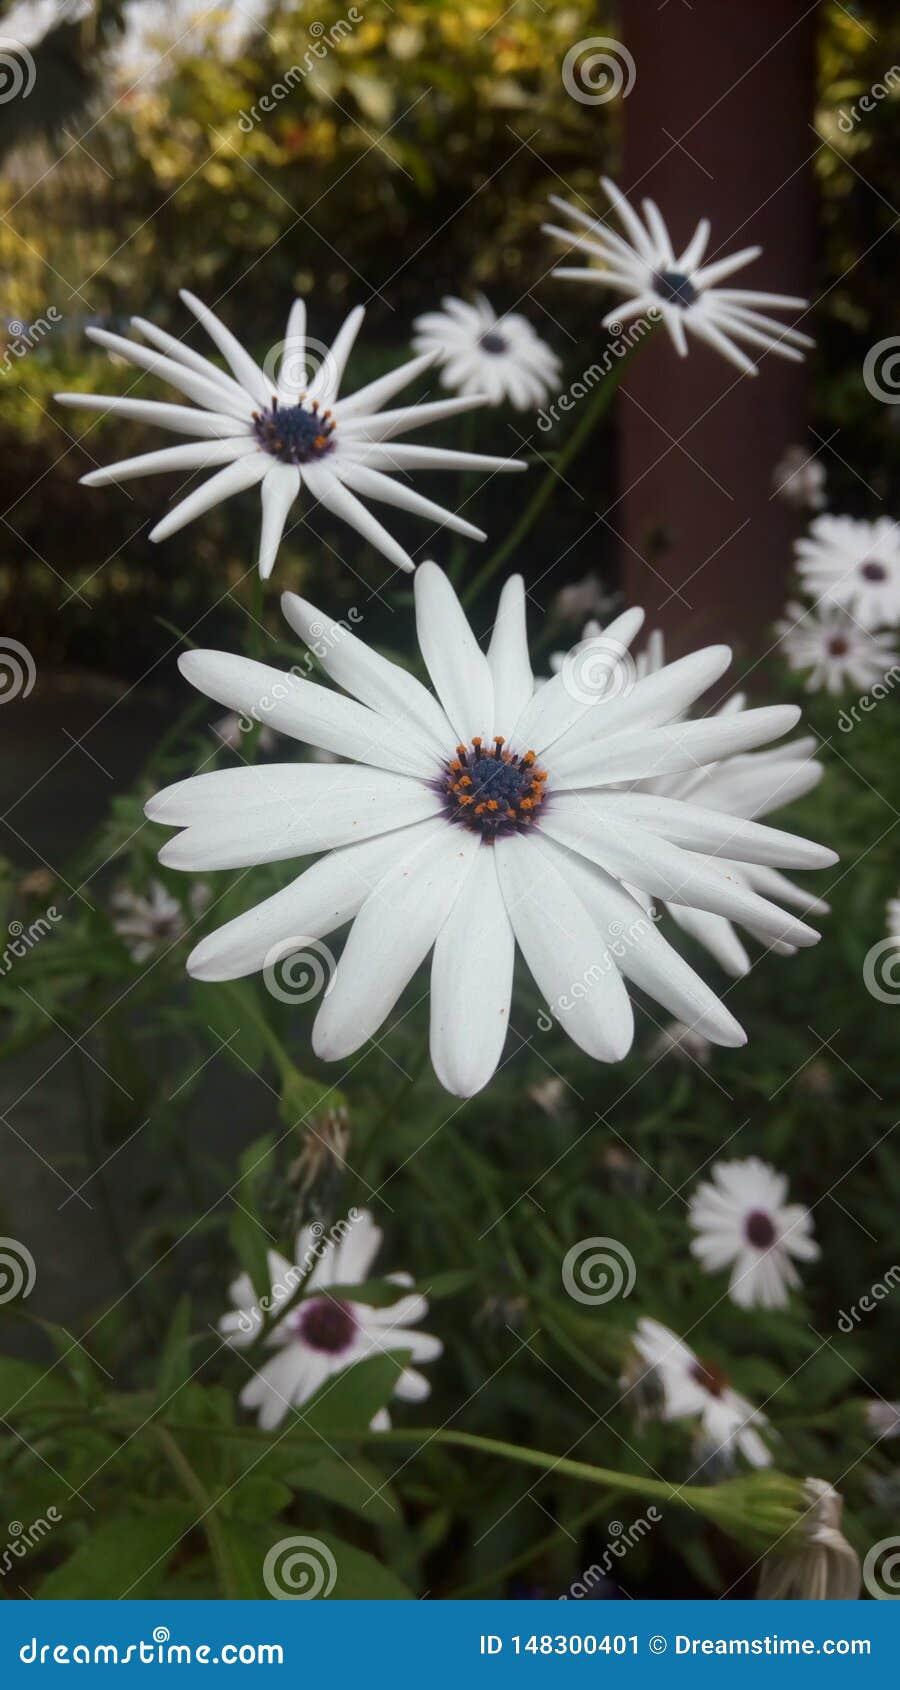 Afrikanische Gänseblümchen blühen